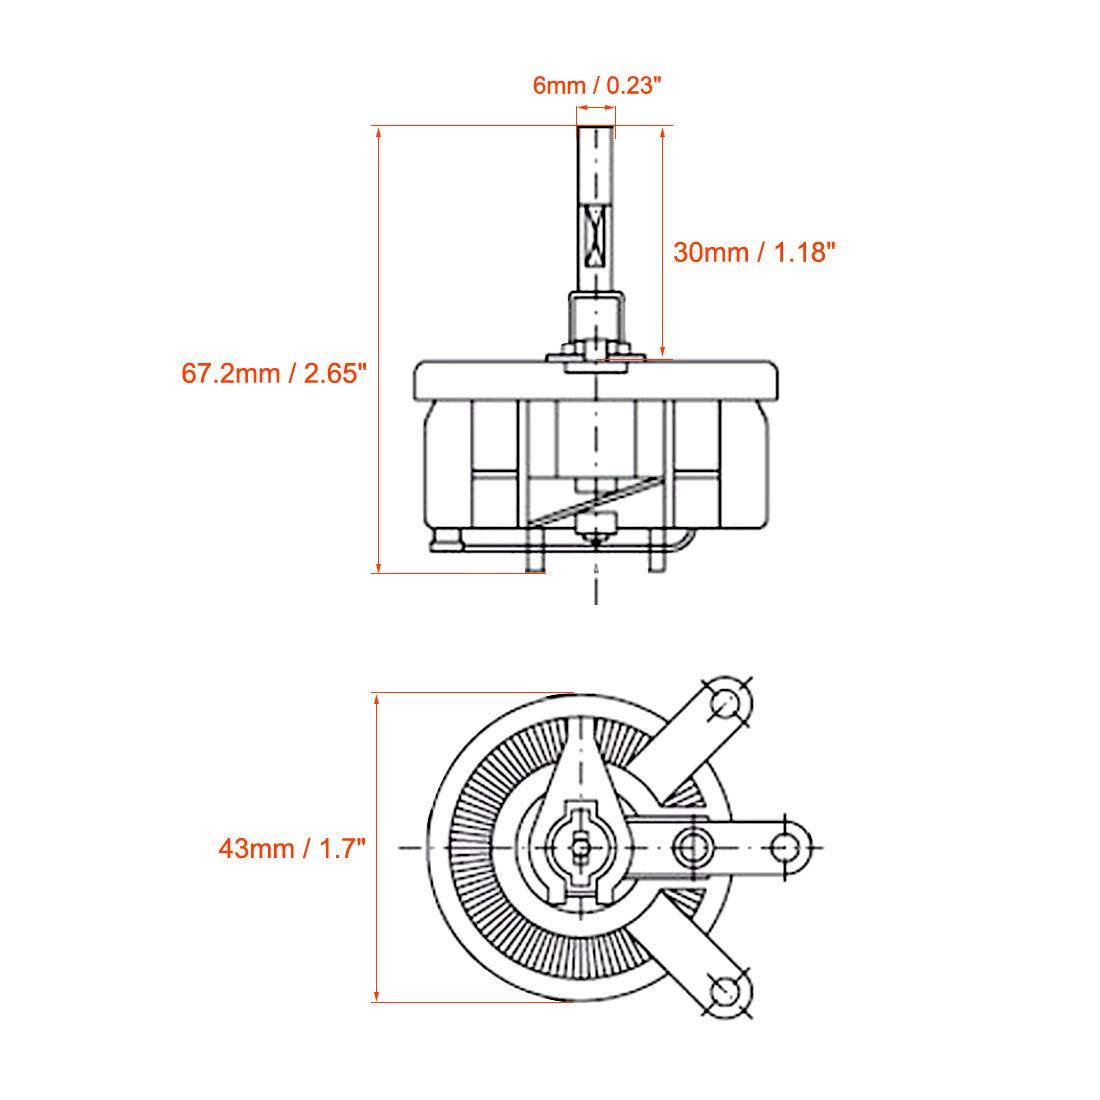 Rheostat Circuit Diagram Wiring In Your Rheostats